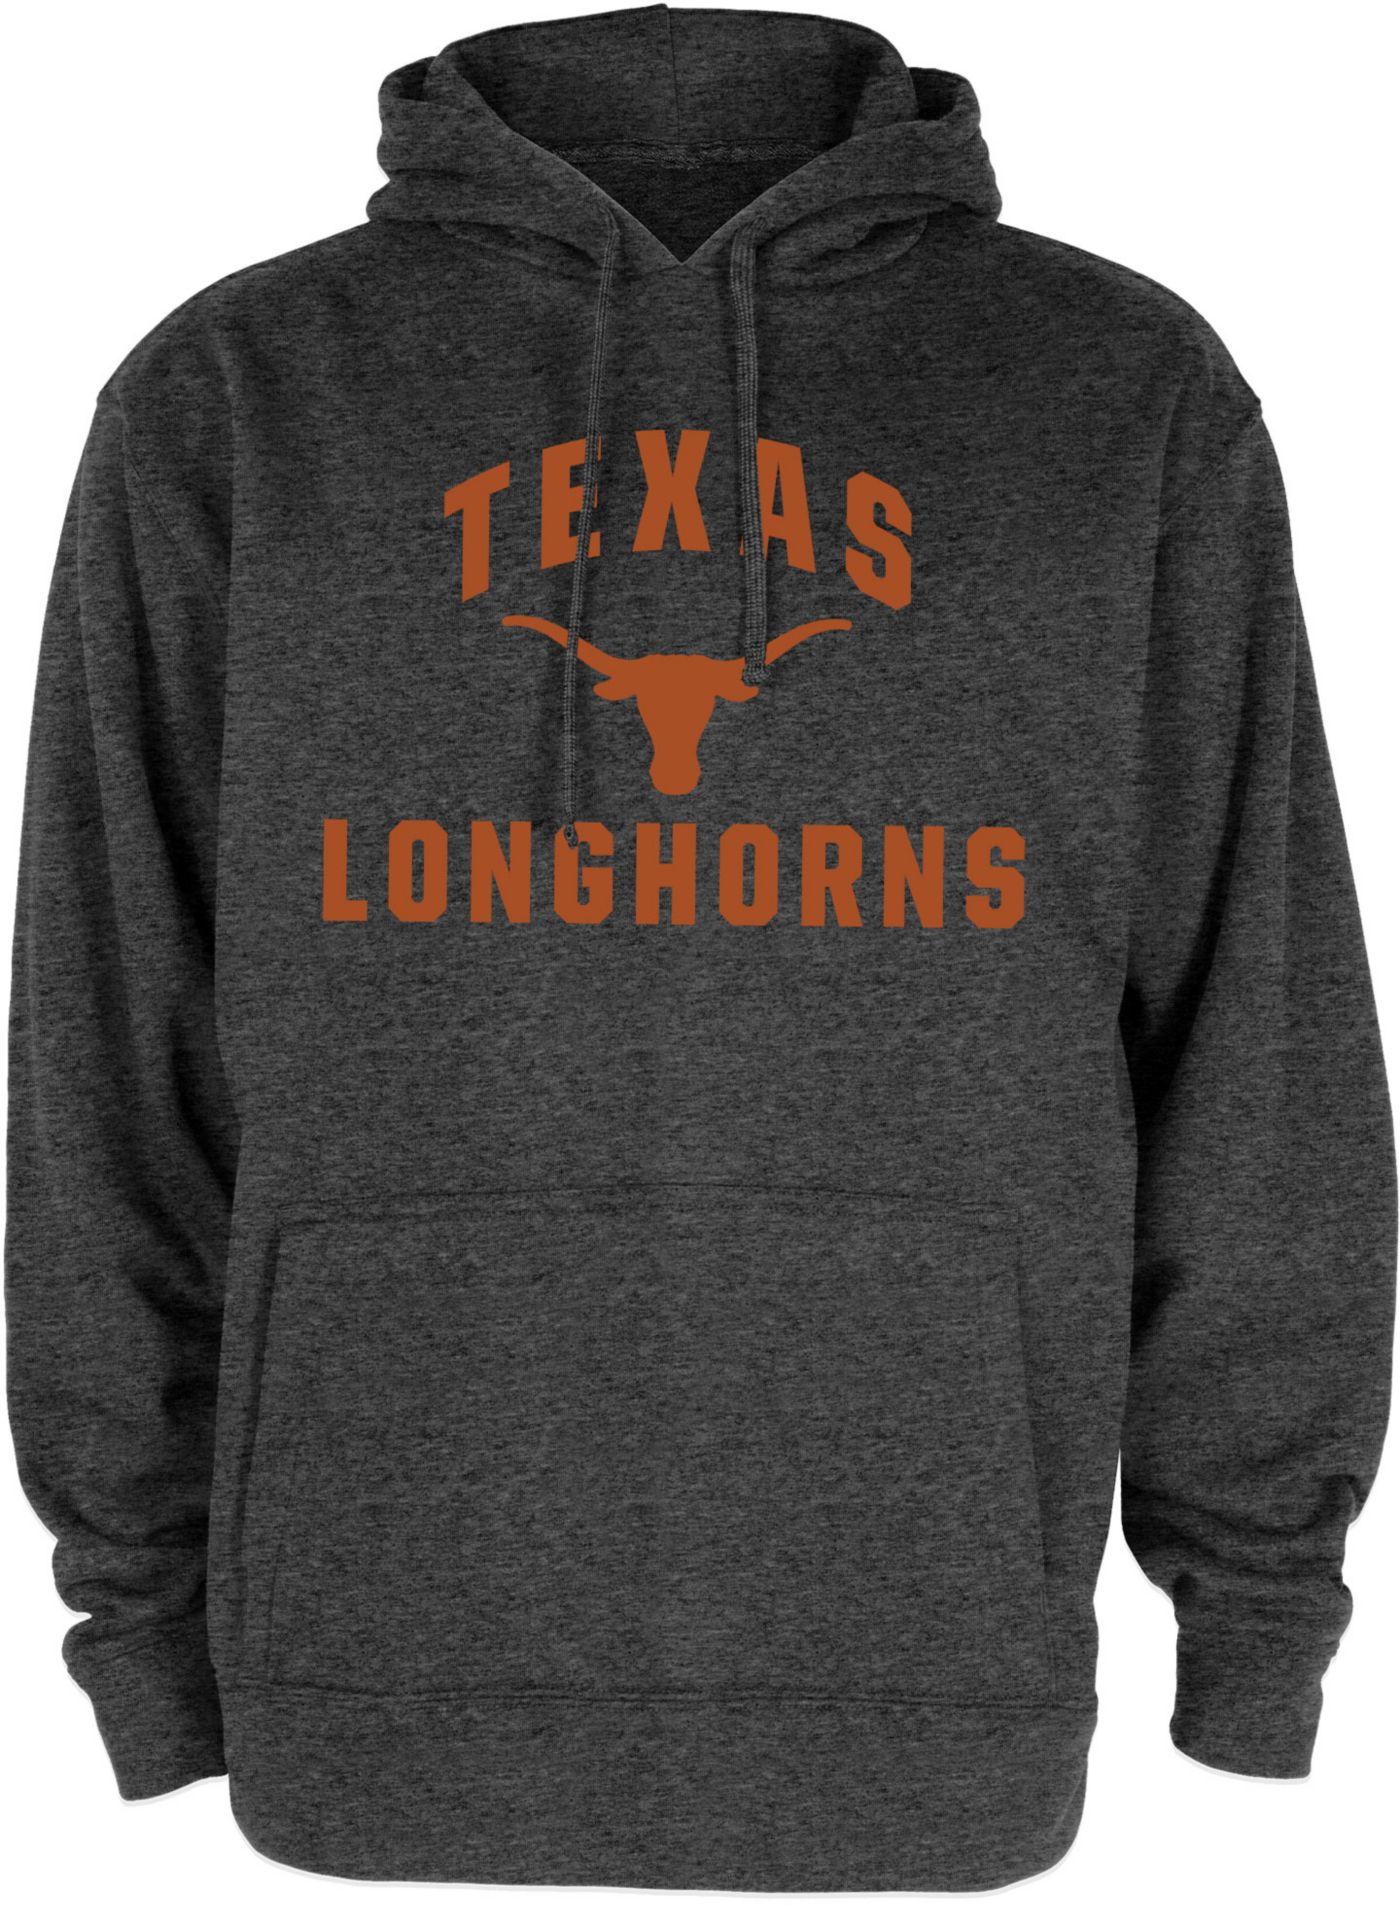 University of Texas Authentic Apparel Men's Texas Longhorns Grey Hoodie